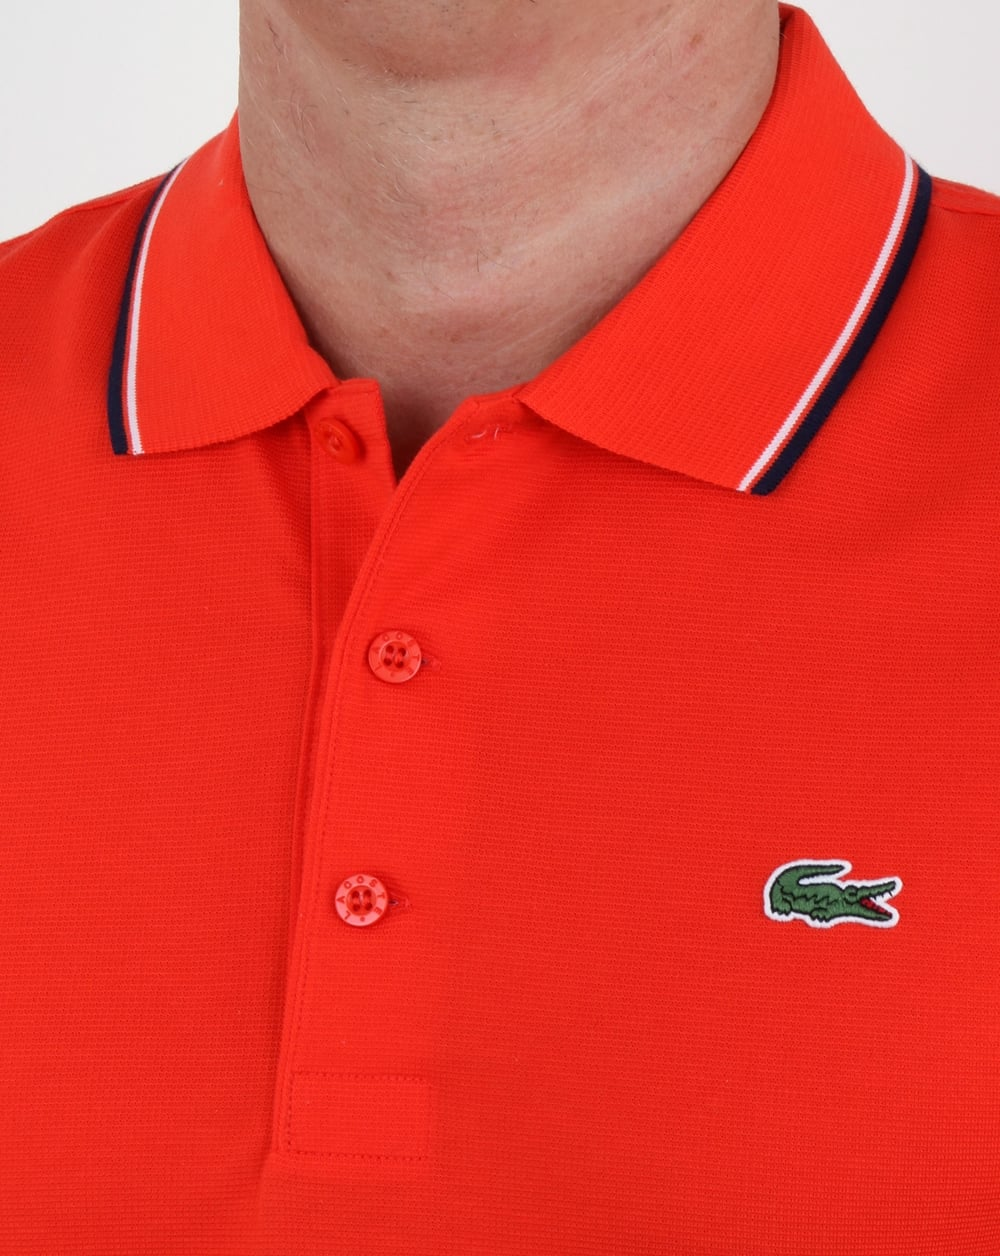 Lacoste Tipped Polo Shirt Etna Rednavy Mens Top